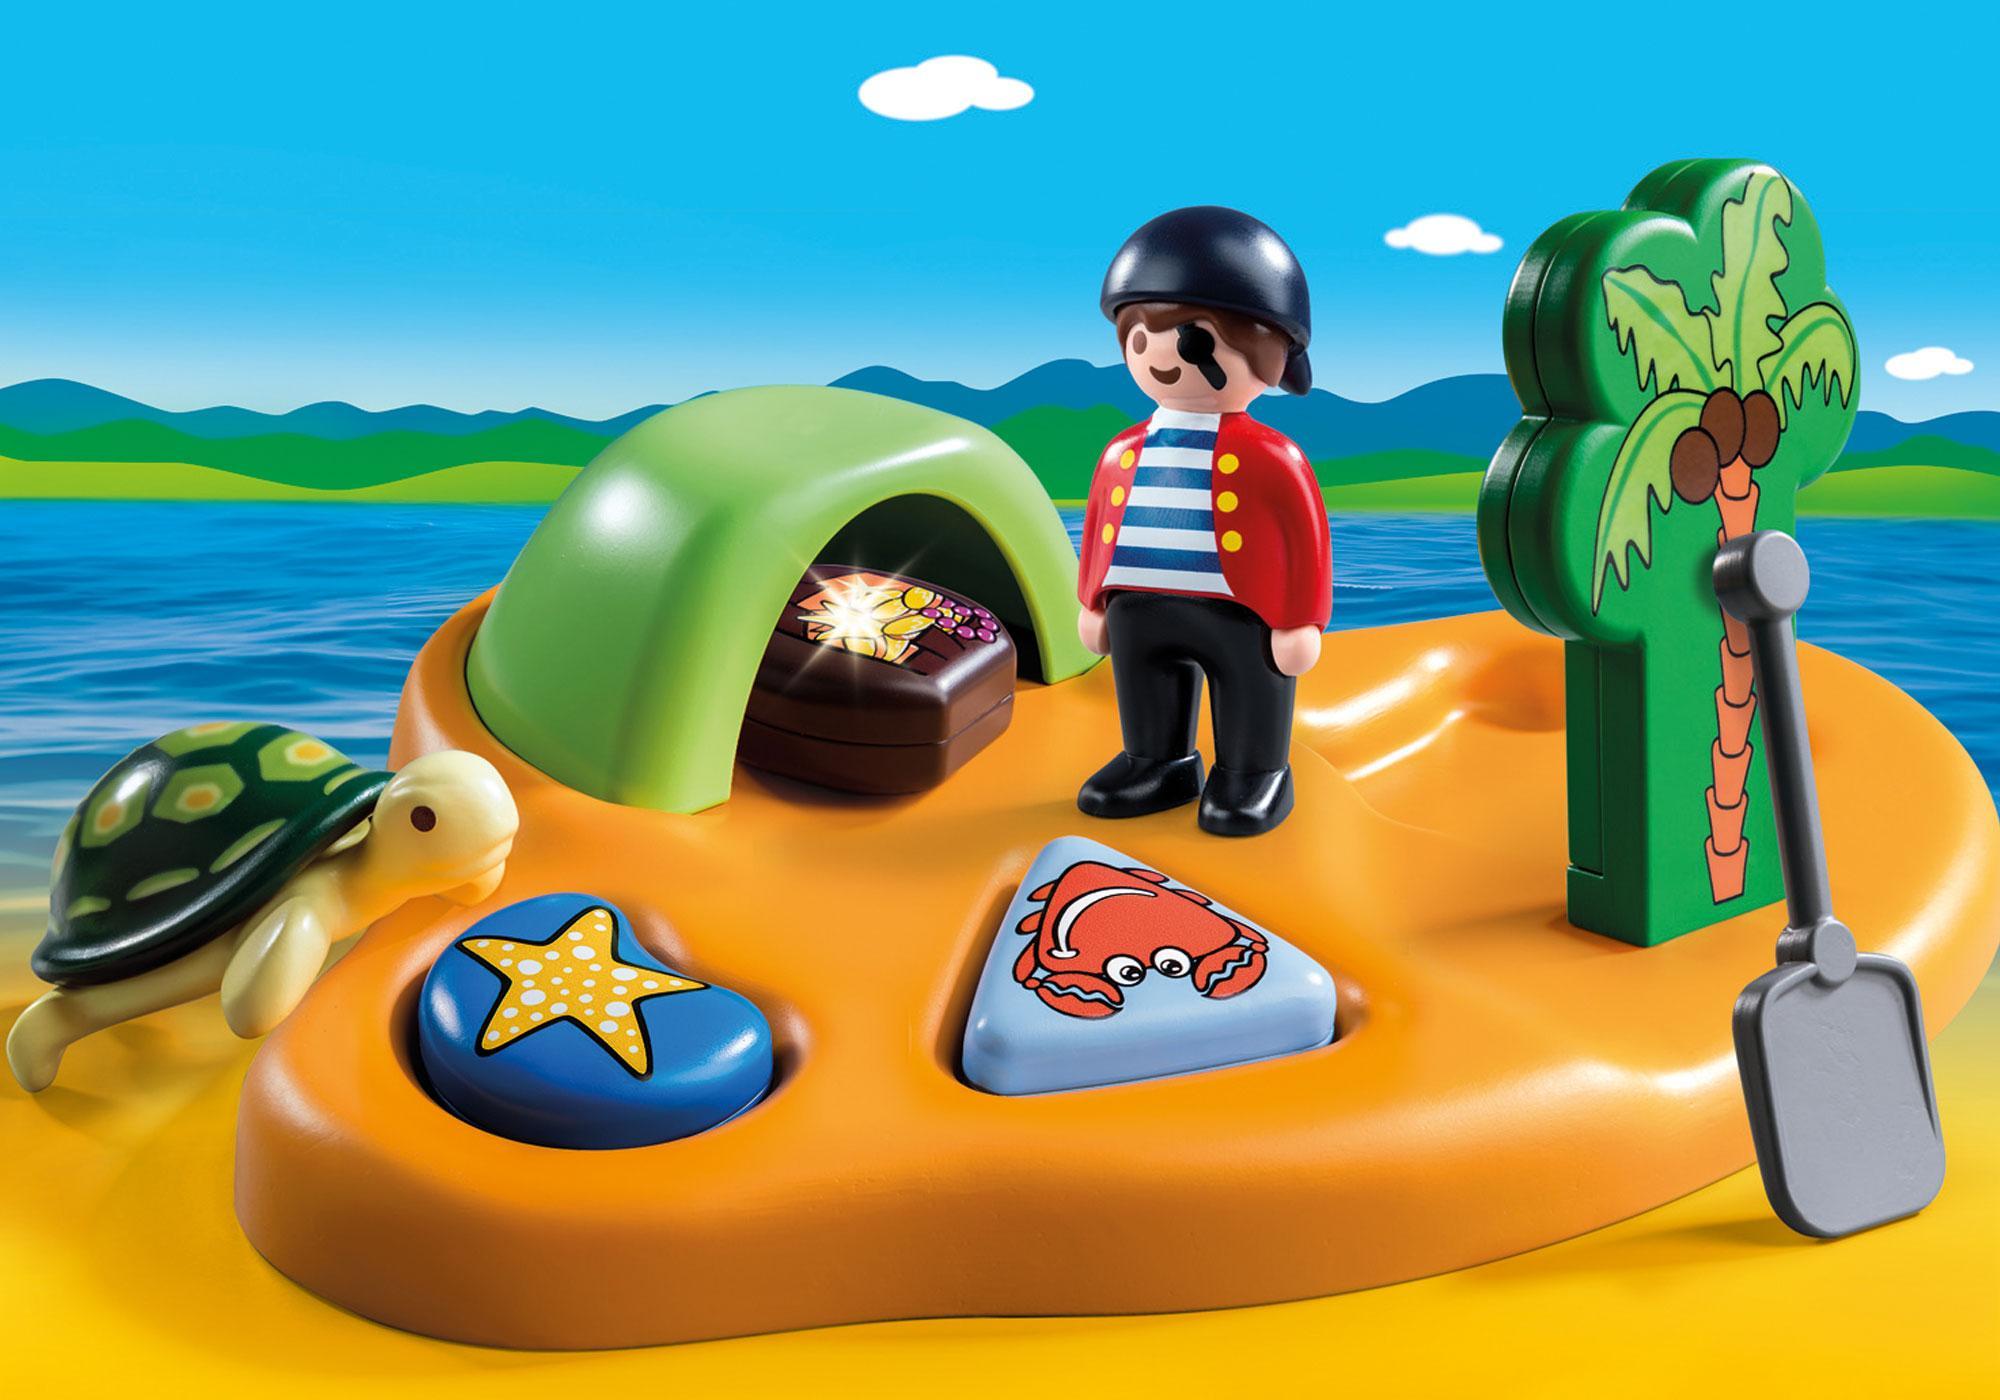 http://media.playmobil.com/i/playmobil/9119_product_detail/Pirate Island